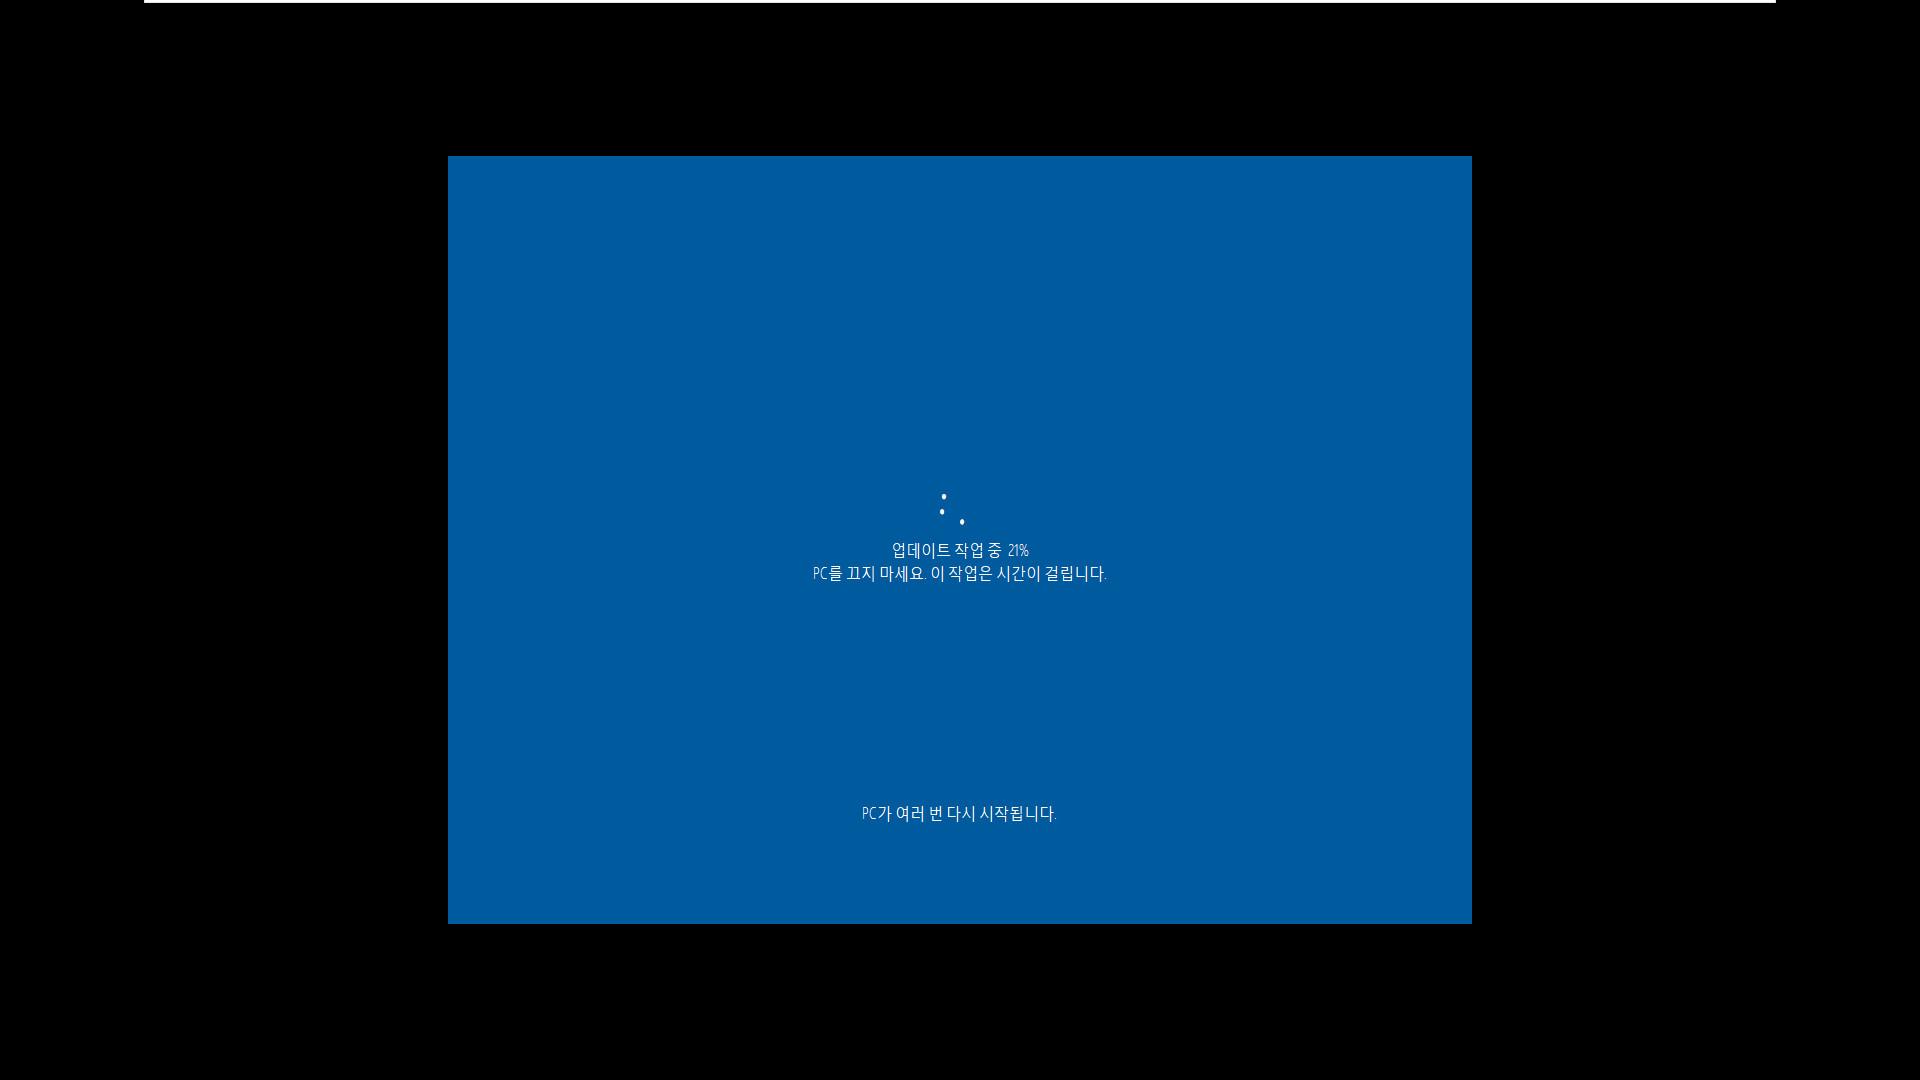 Windows 10 Enterprise LTSC [2019] (버전 1809) 를 버전 1903 프로로 업그레이드 설치하기 - 우선 설정과 앱 유지를 위해서 버전 1903 Enterprise로 업그레이드 한 후에 버전 1903 Pro로 변경하면 됩니다 2019-11-12_051607.jpg